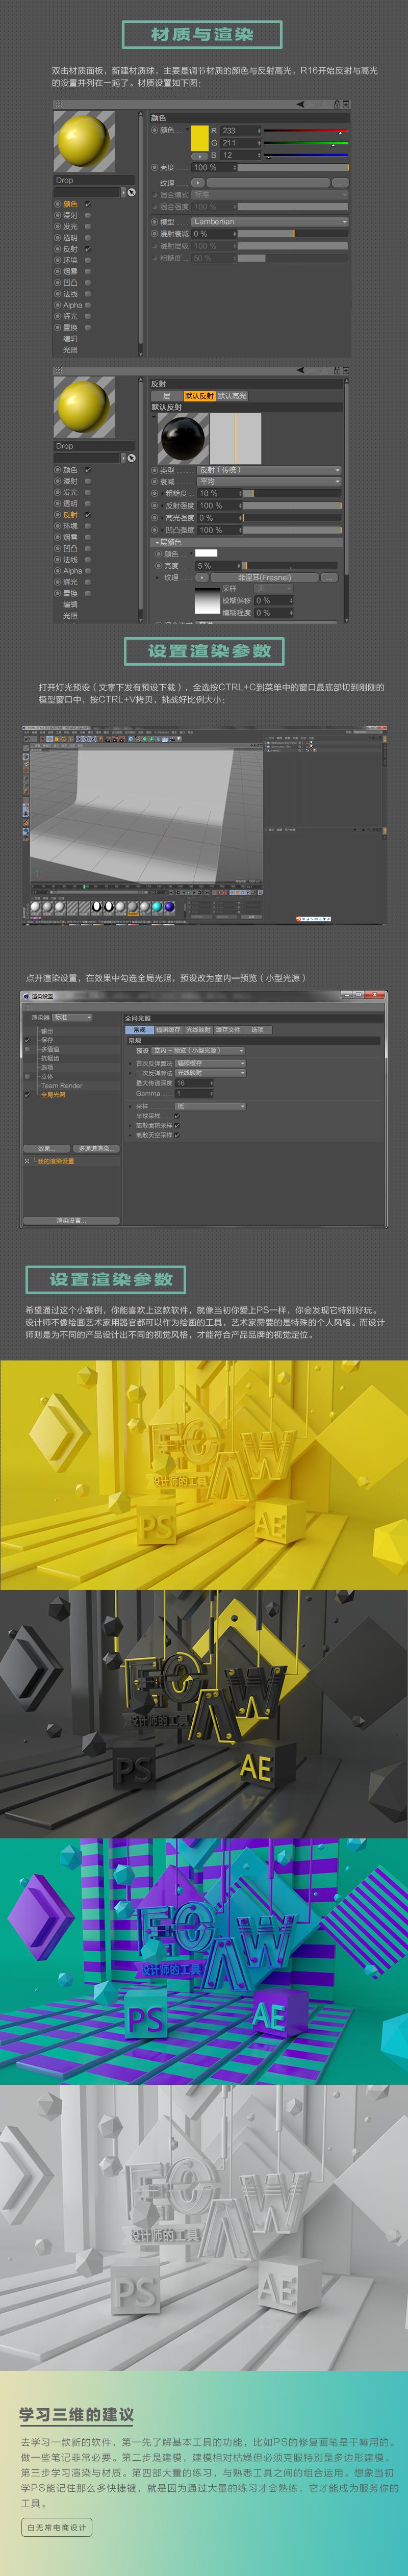 C4D教程!教你创造酷炫的3D字体(附建模软件科普)